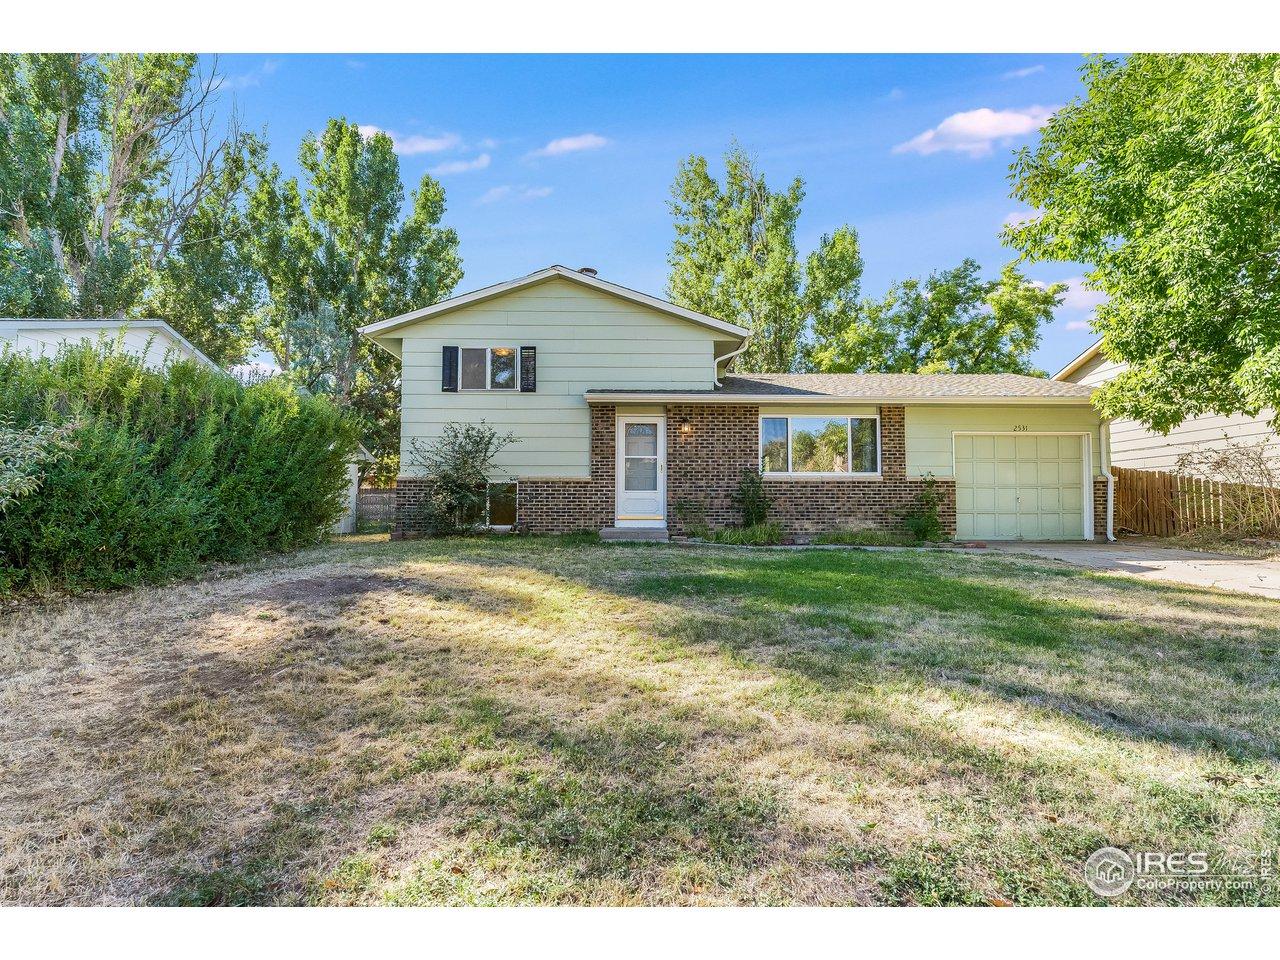 2531 W Laurel St, Fort Collins CO 80521